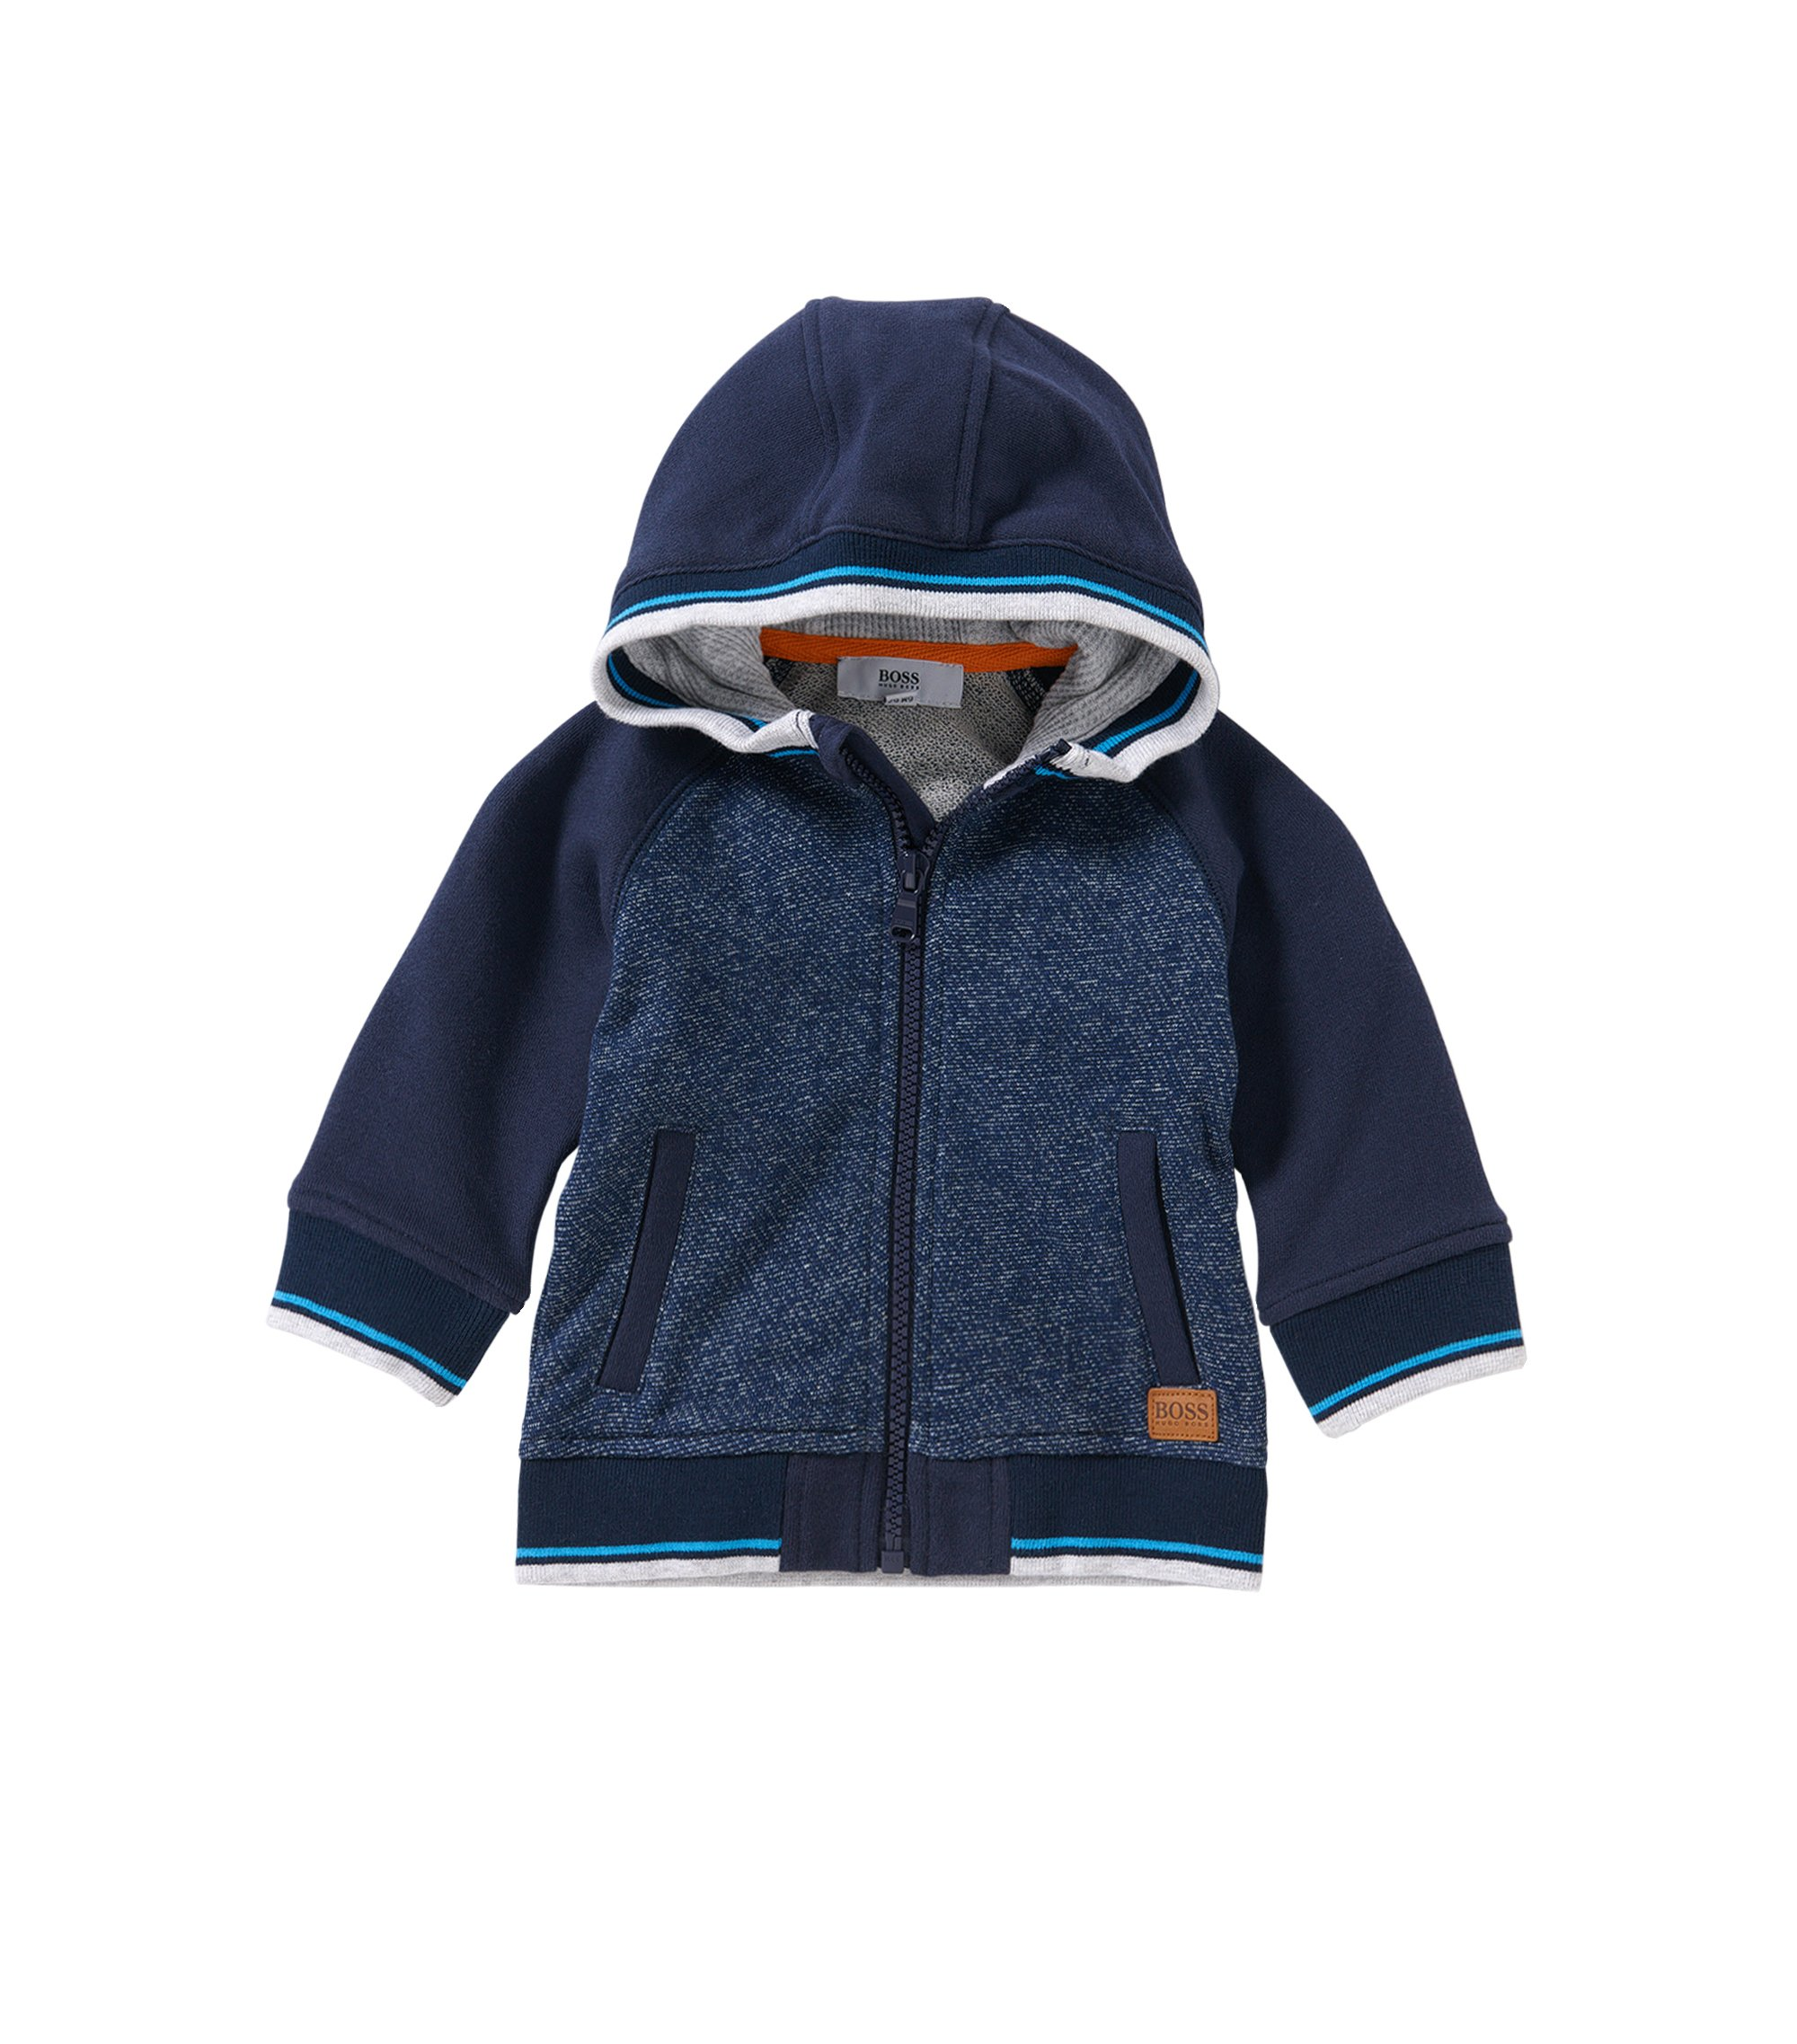 Baby-Kapuzen-Sweatjacke aus Baumwolle: 'J05469', Dunkelblau